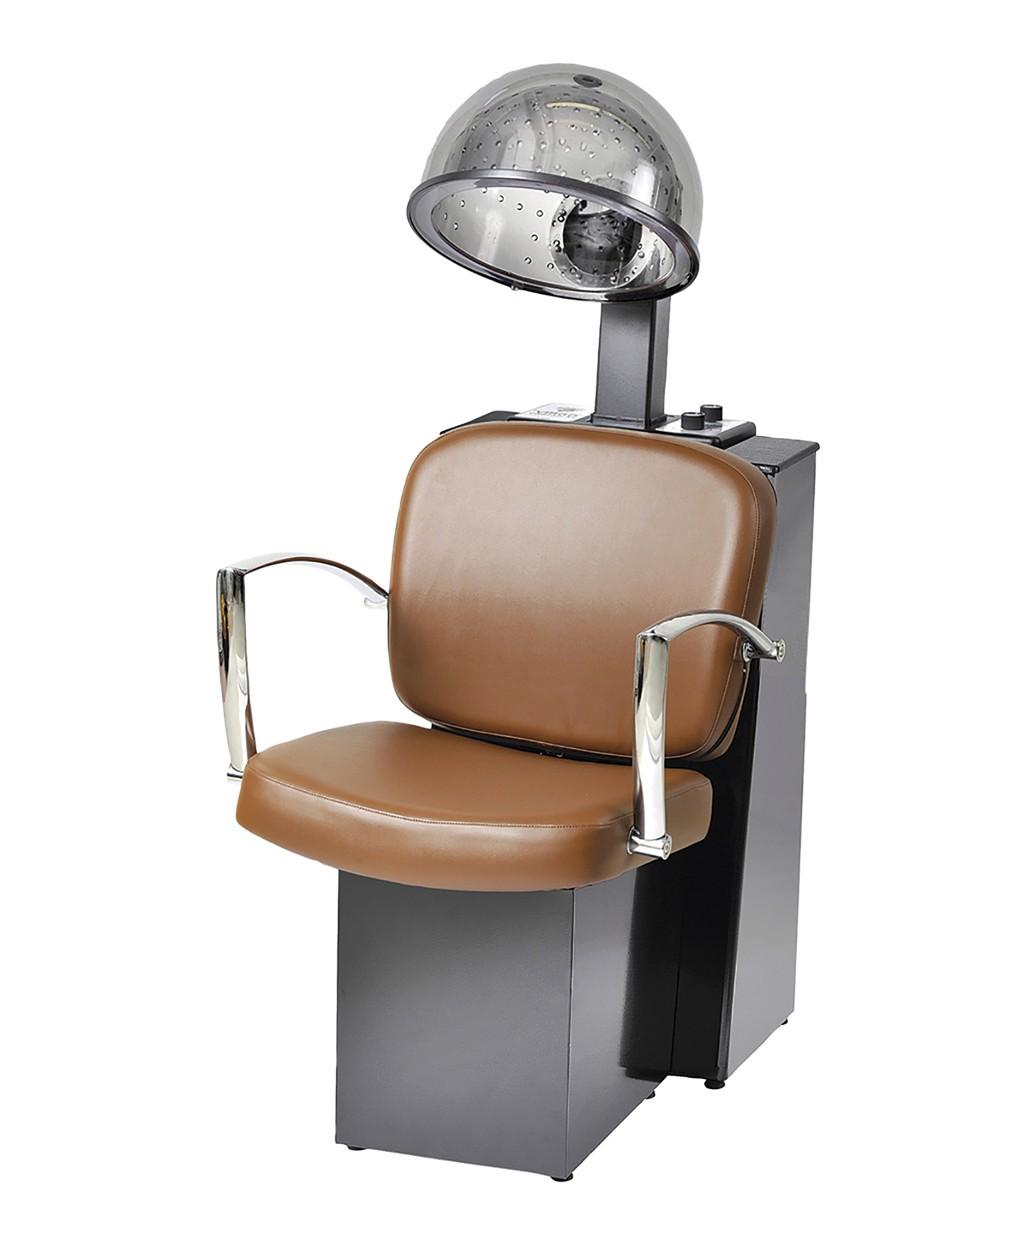 4 Operator Pibbs 3606 Messina Package Pibbs 3769 Pisa Dryer Chair